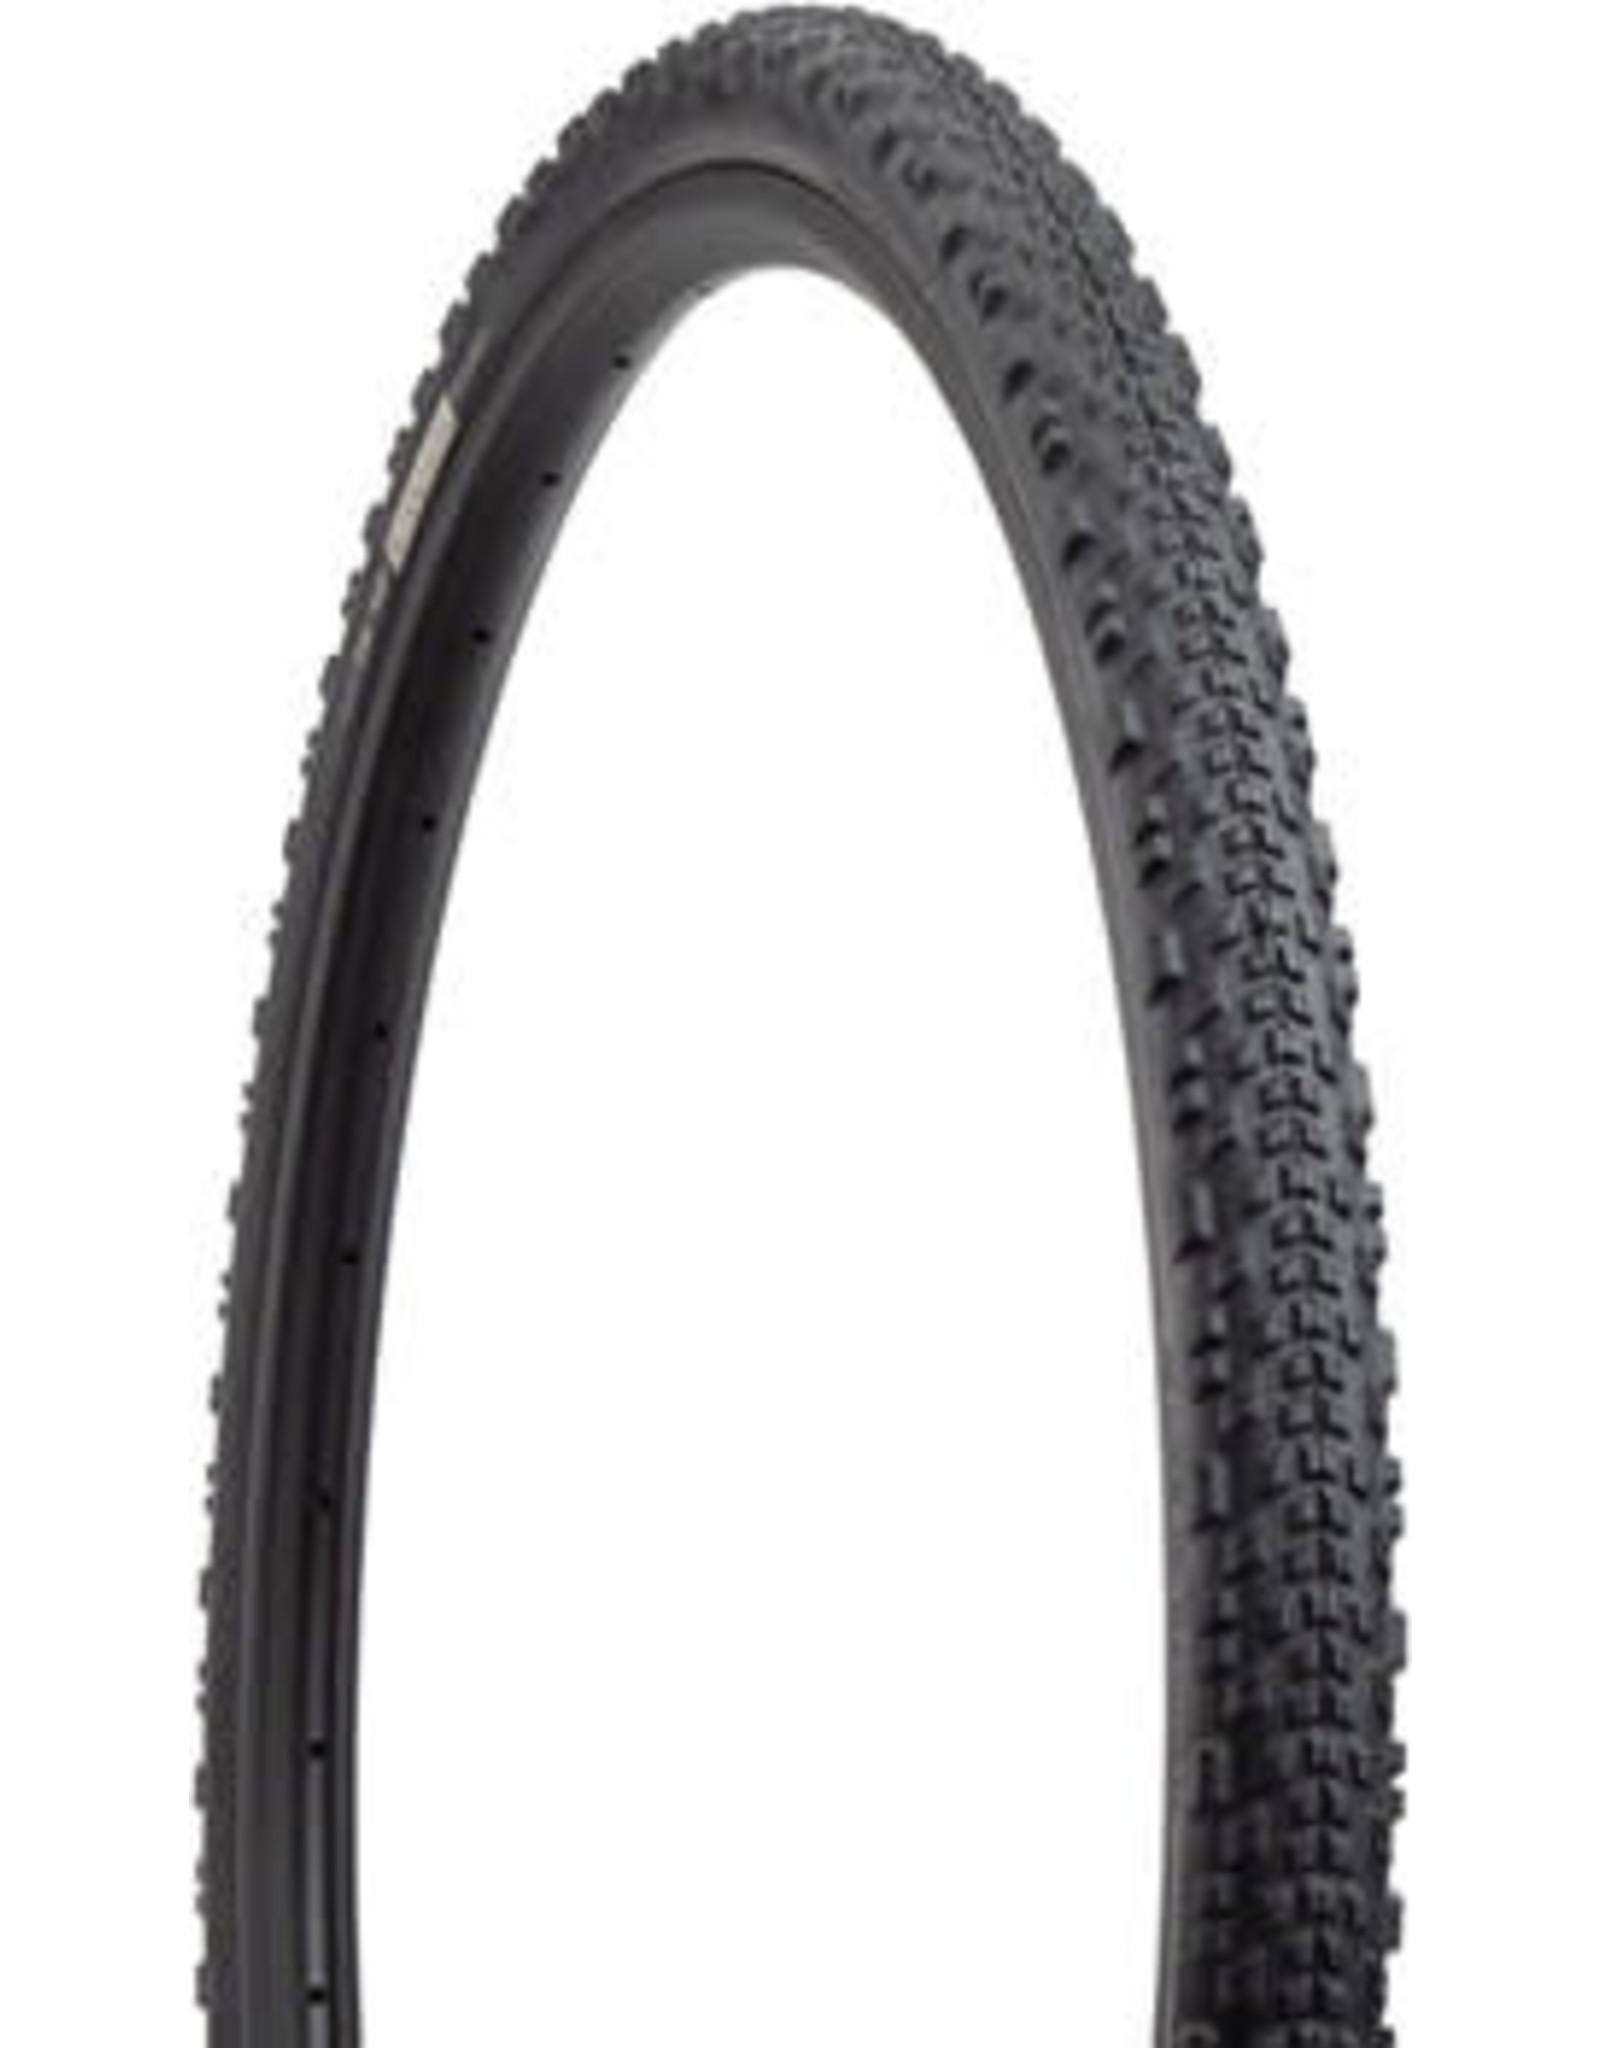 Teravail Teravail Rutland Tire - 700 x 38, Tubeless, Folding, Black, Durable